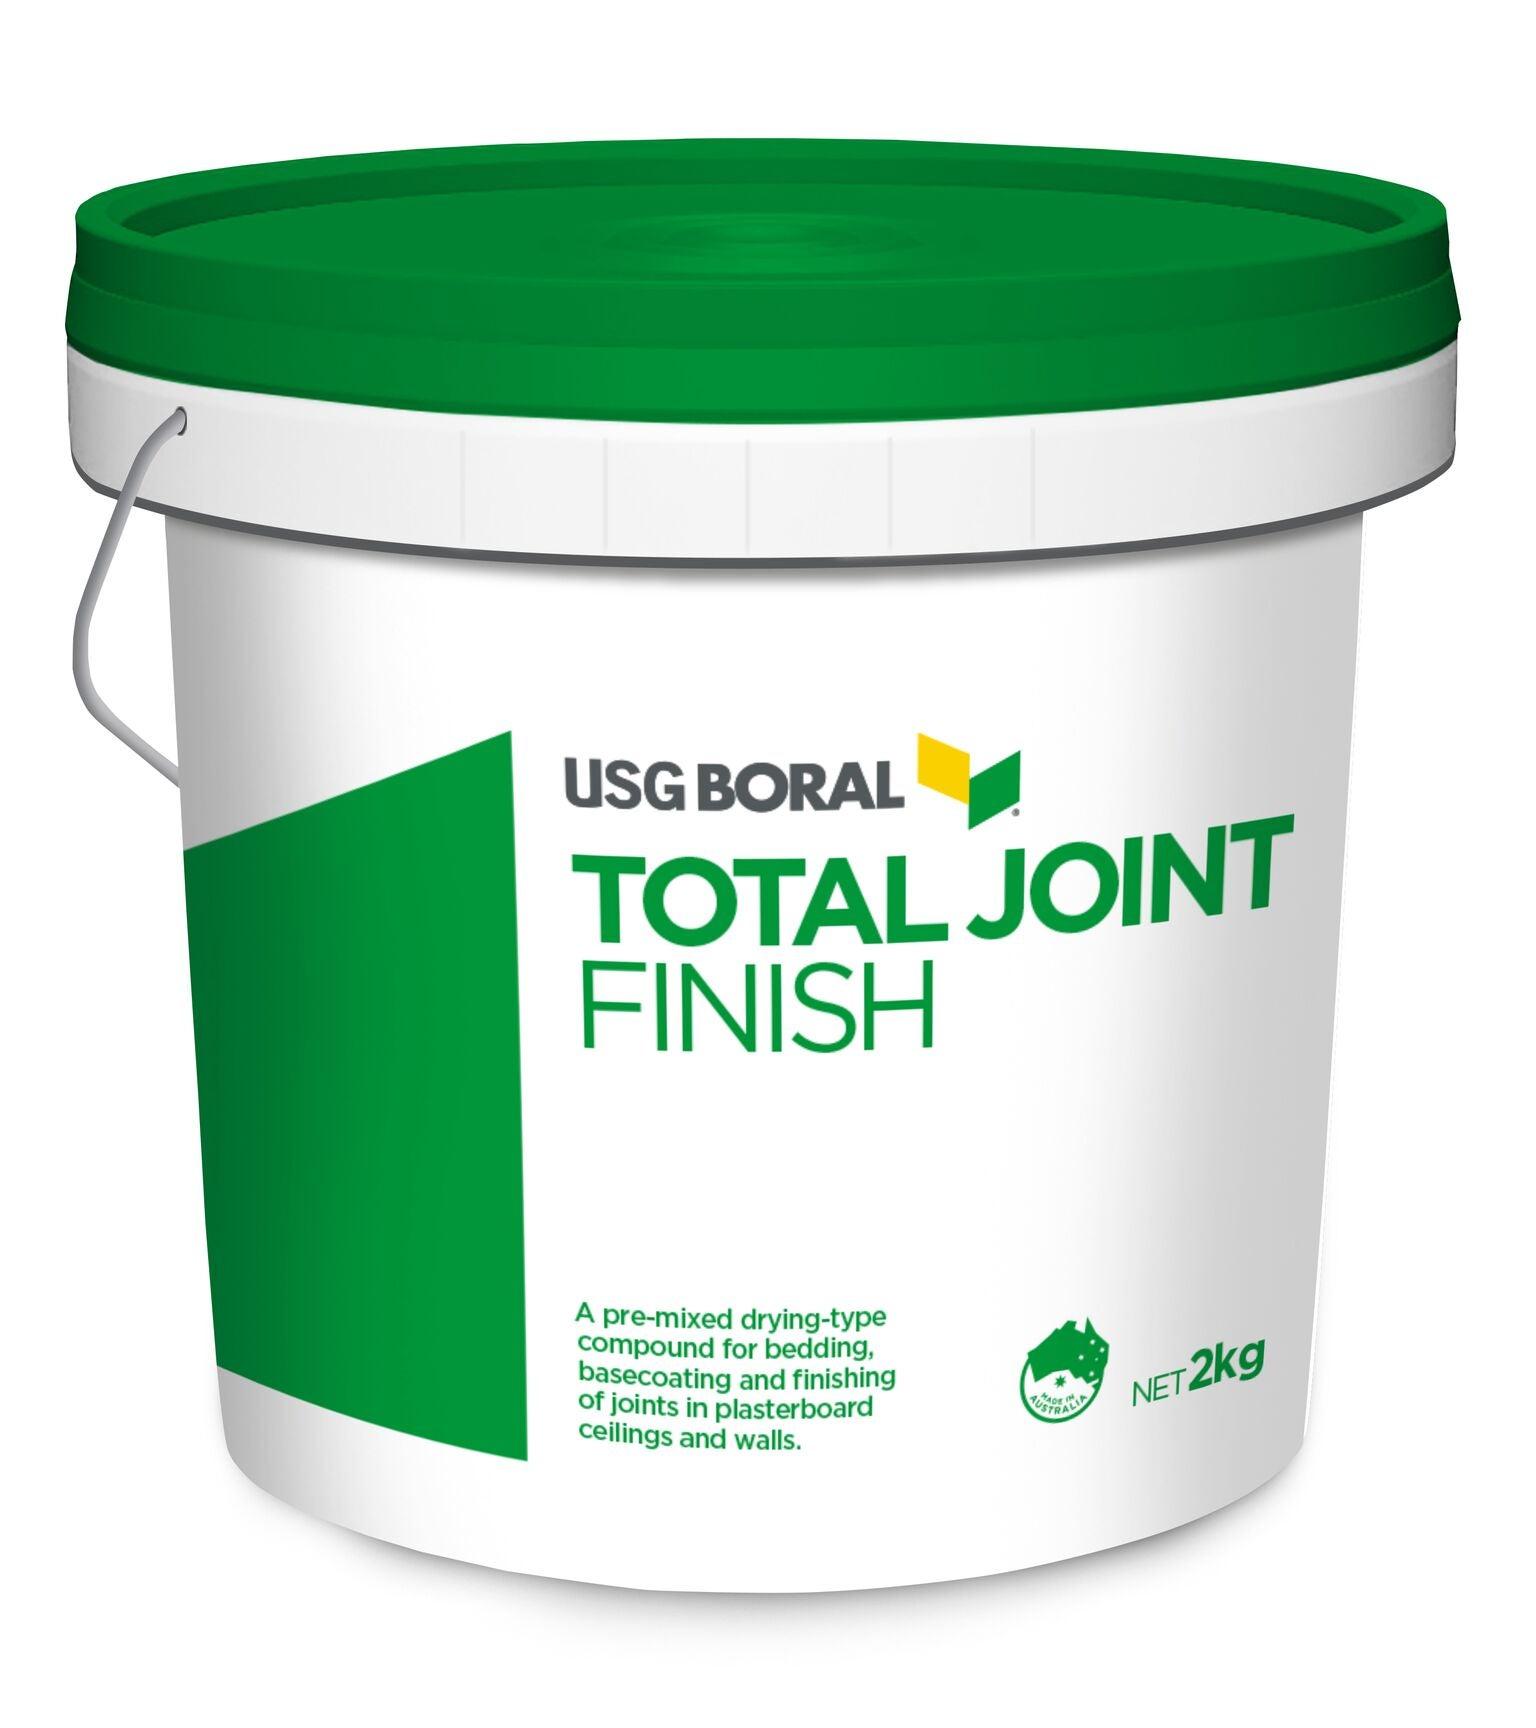 USG Boral Total Joint Finish